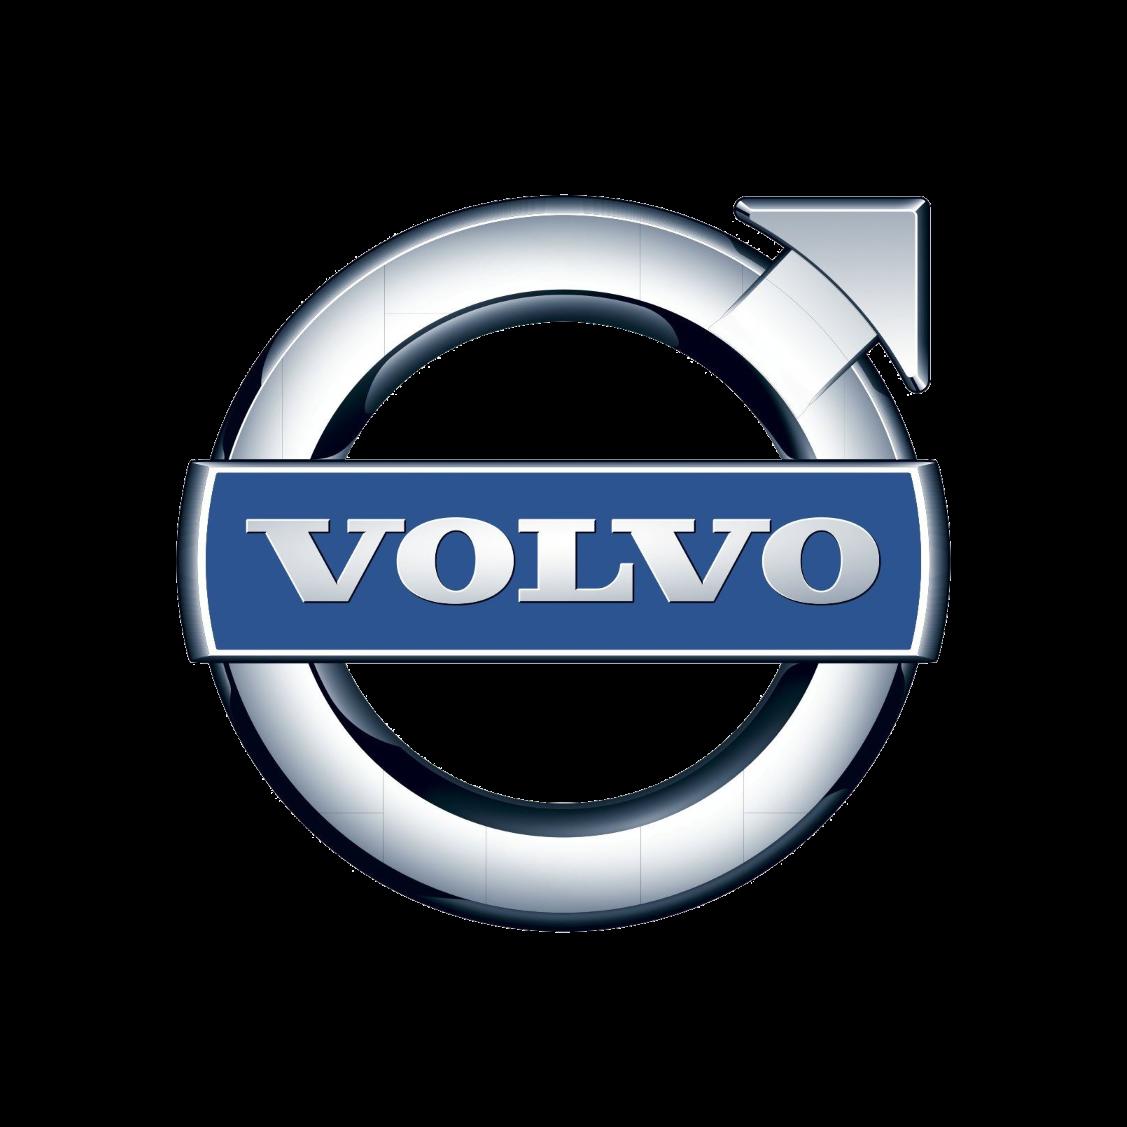 Ремонт форсунок Volvo FH12, FH13, FH16, FM